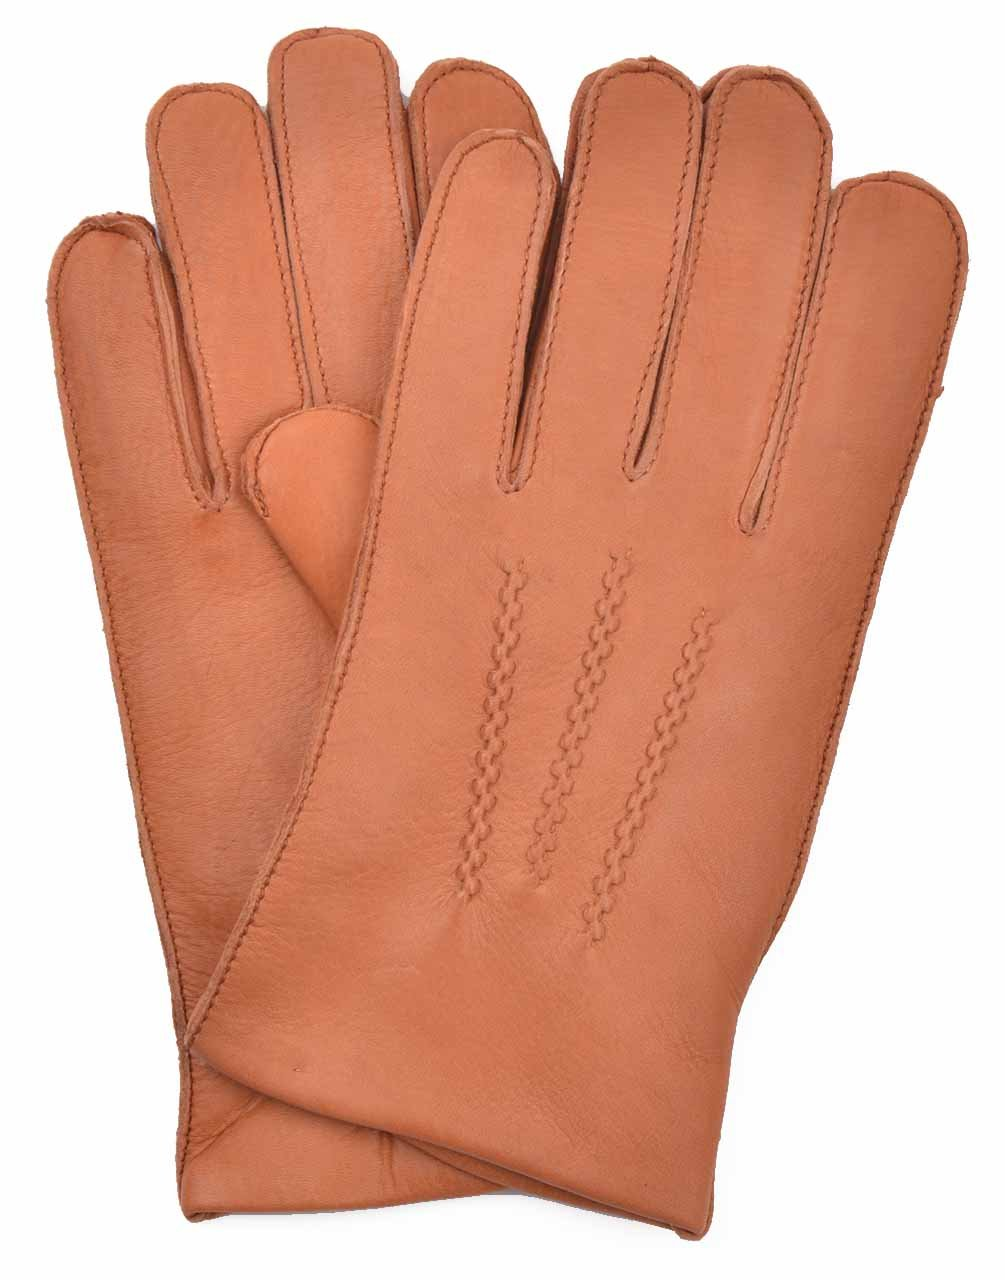 YISEVEN Men's Deerskin Leather Dress Gloves Fleece Lined Three Points Short Cuffs Genuine Luxury Soft Hand Warm wool Heated Fur Lining Winter Driving Motorcycle Work Xmas Gifts, Cognac 9.0''/M